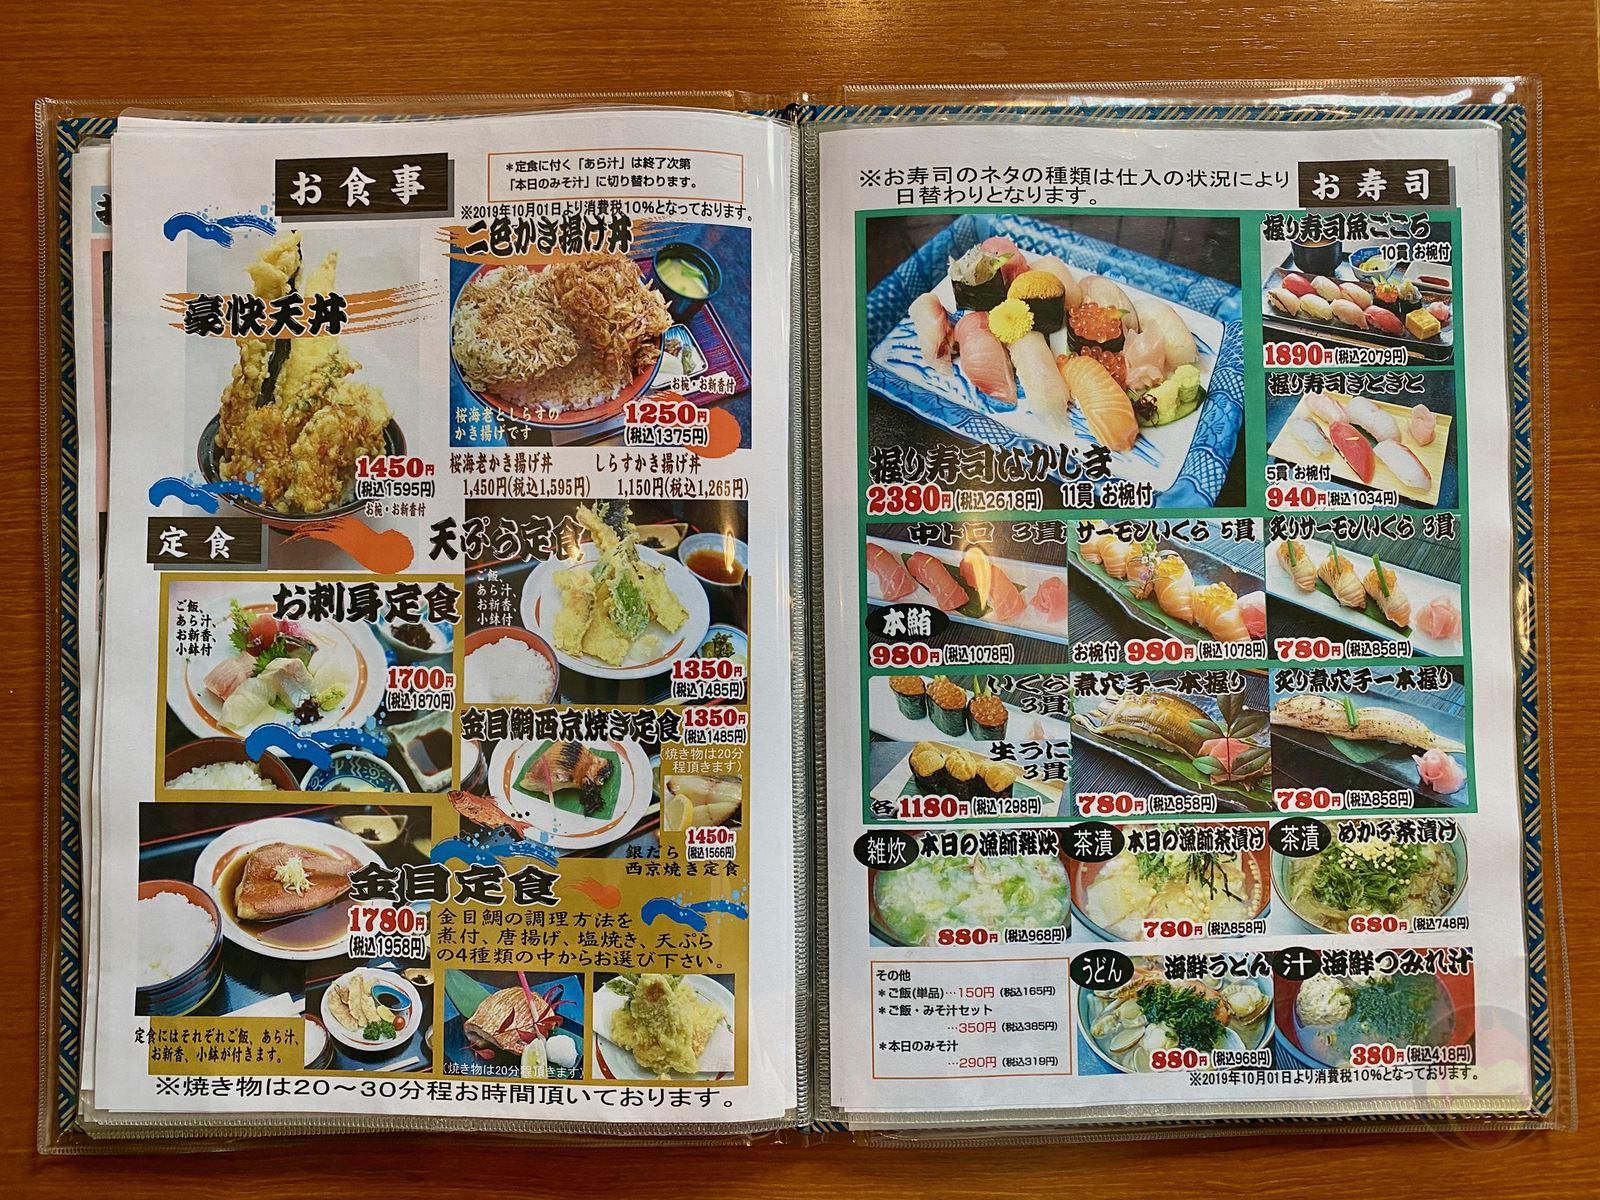 KitoKito-Atami-24.jpeg